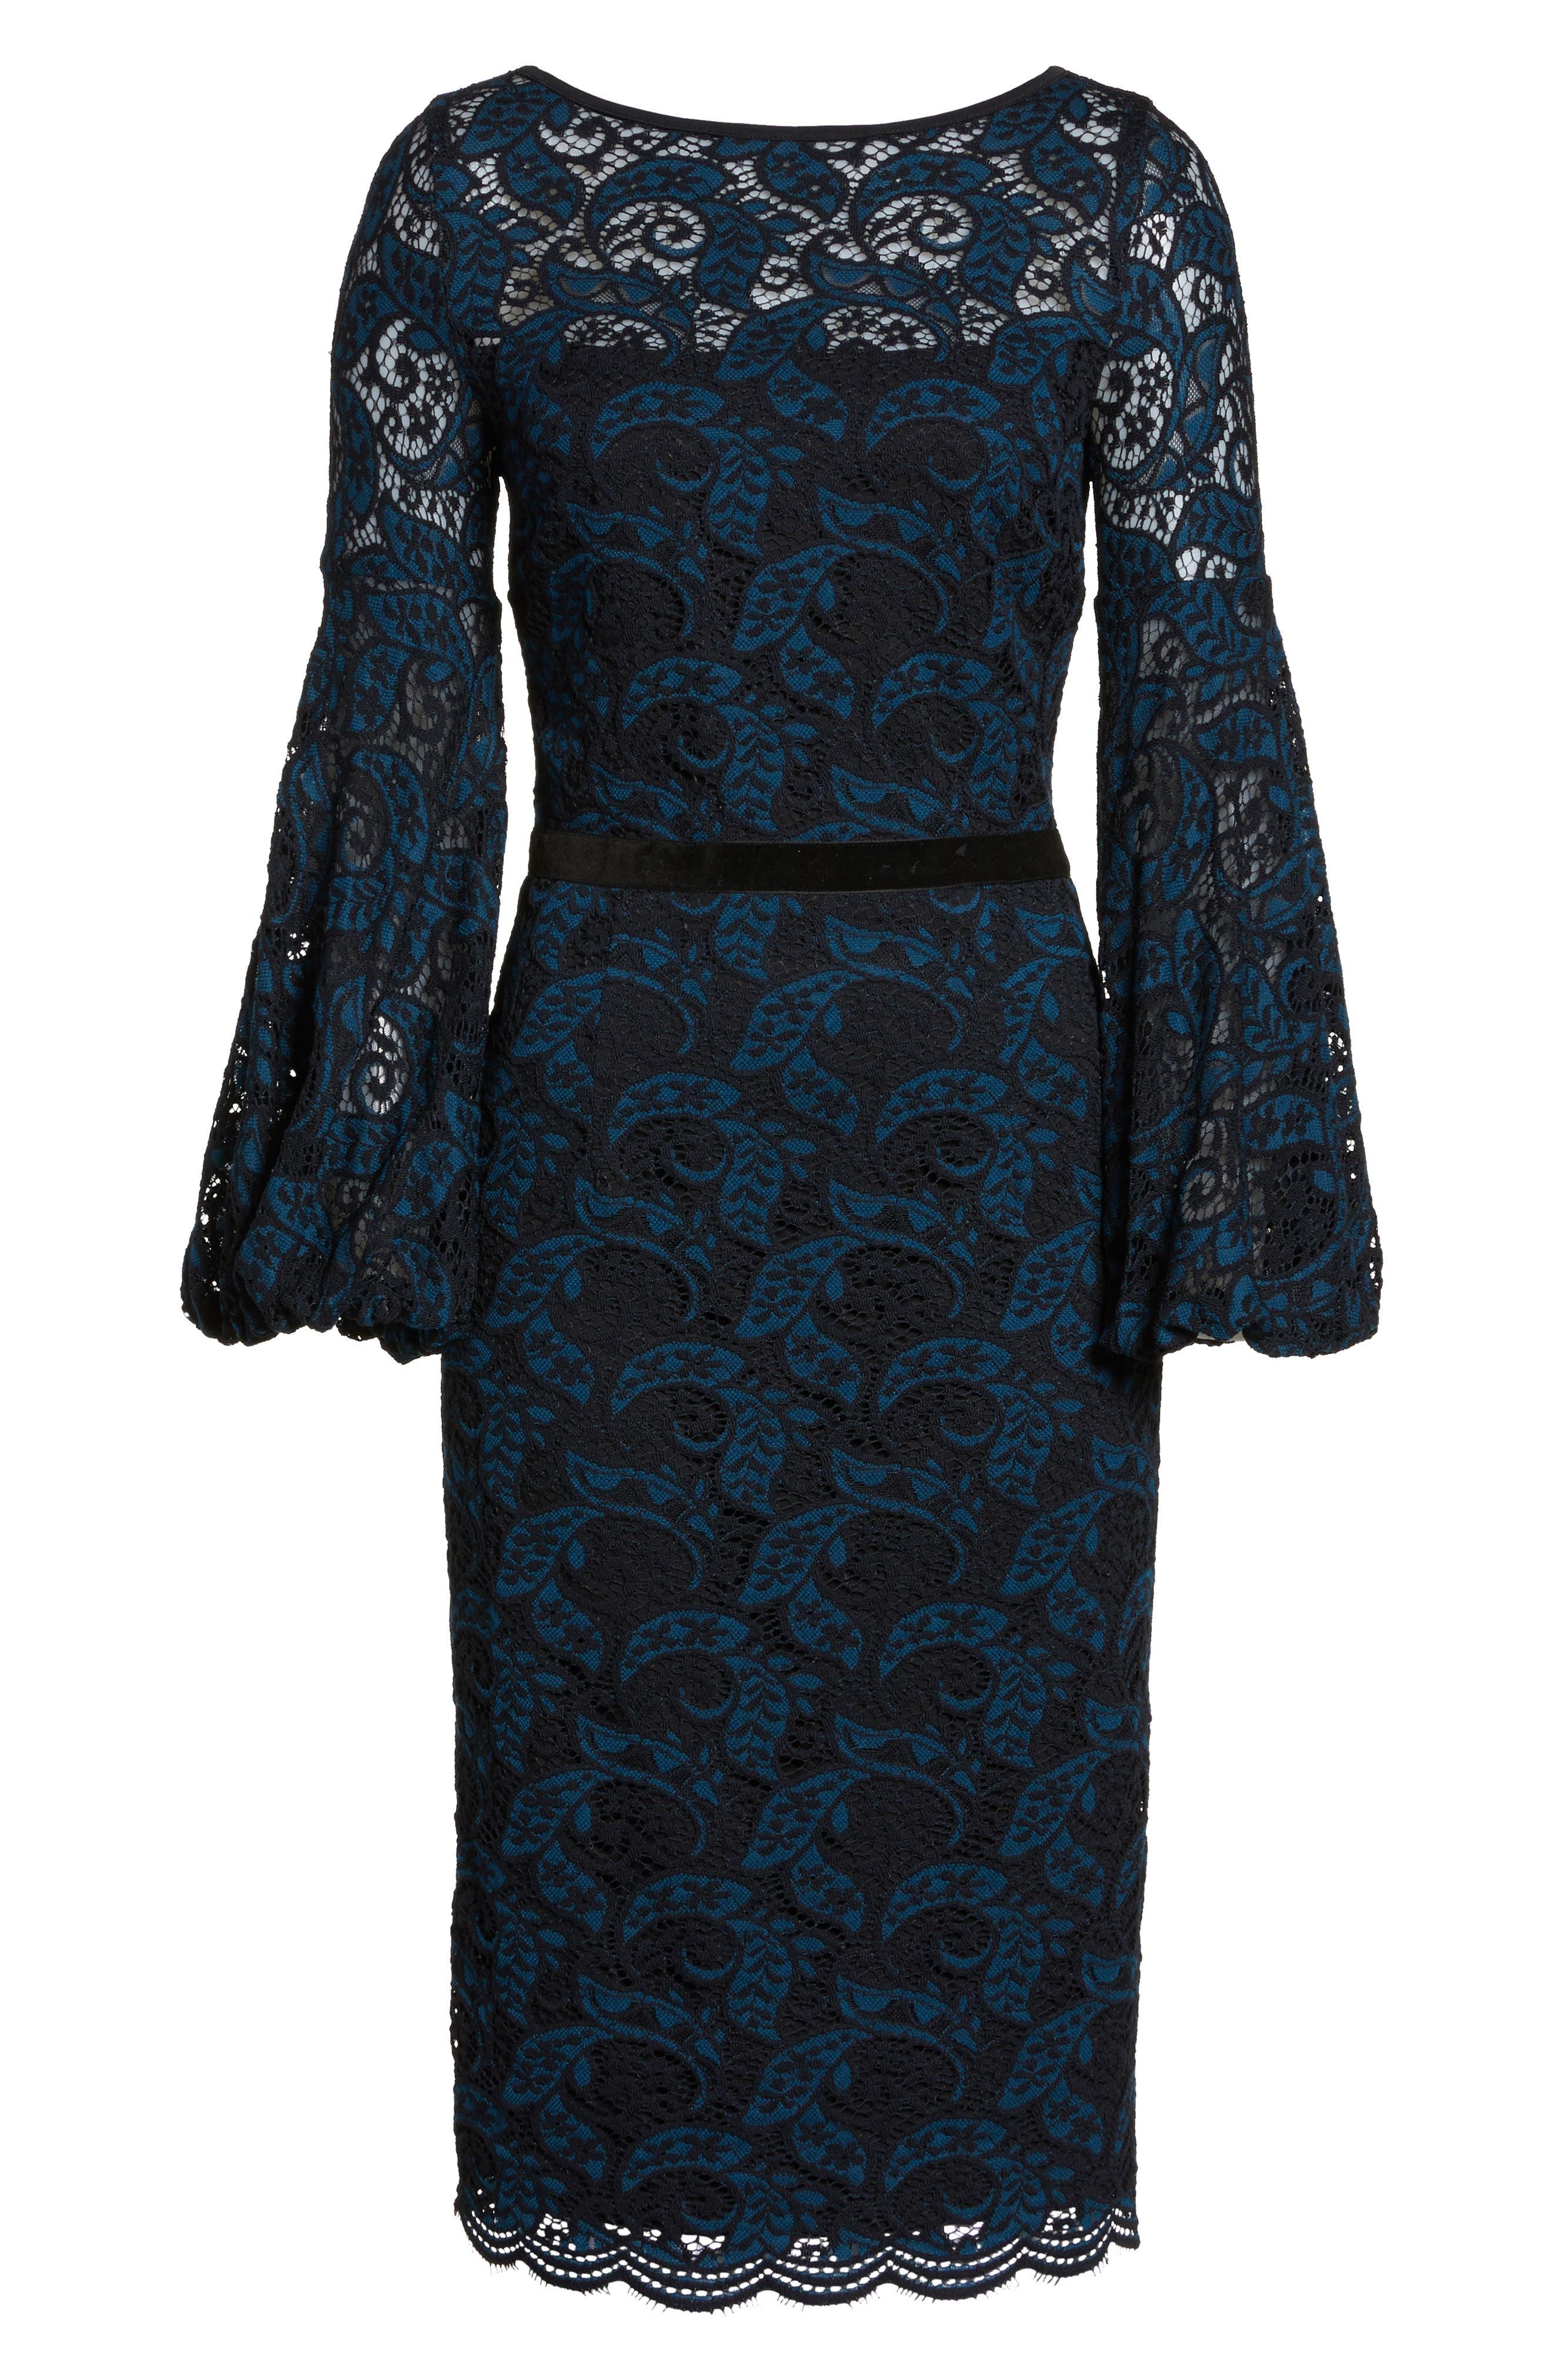 Lace Bishop Sleeve Dress,                             Alternate thumbnail 6, color,                             Blue/ Black